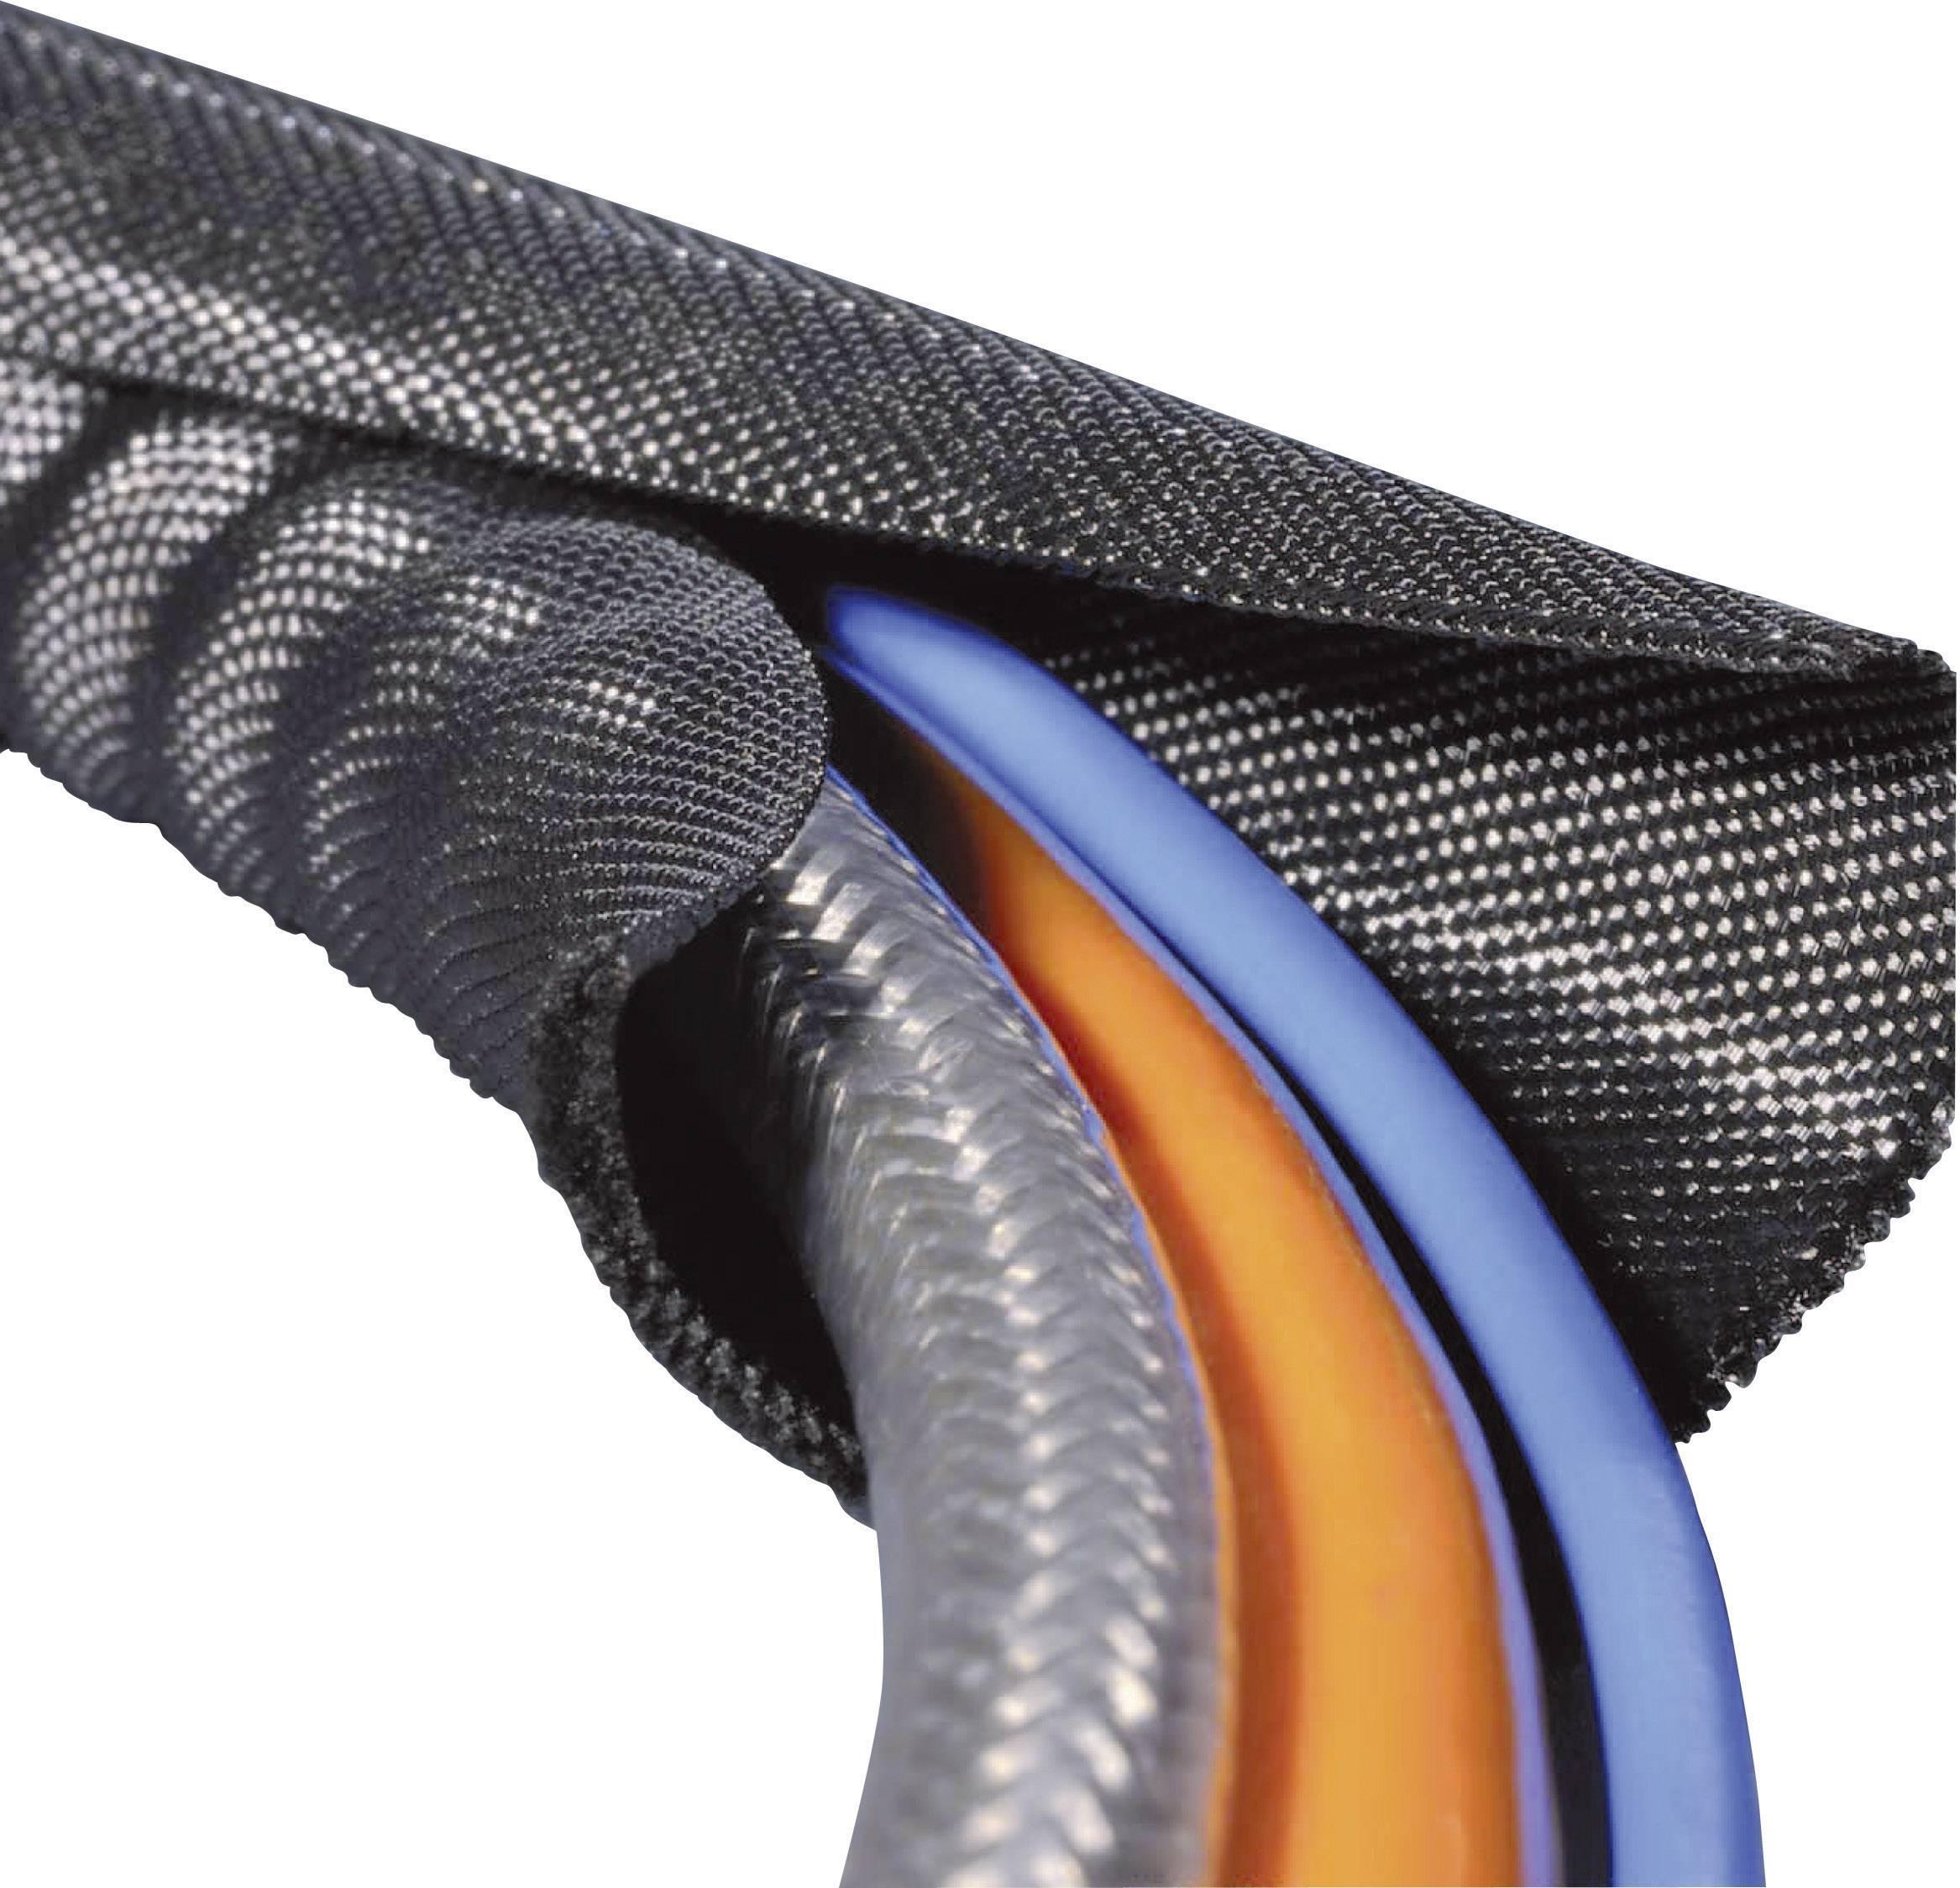 Ochranný oplet HellermannTyton Twist-In 38, 32 do 38 mm, -70 do +125 °C, metrový tovar, čierna